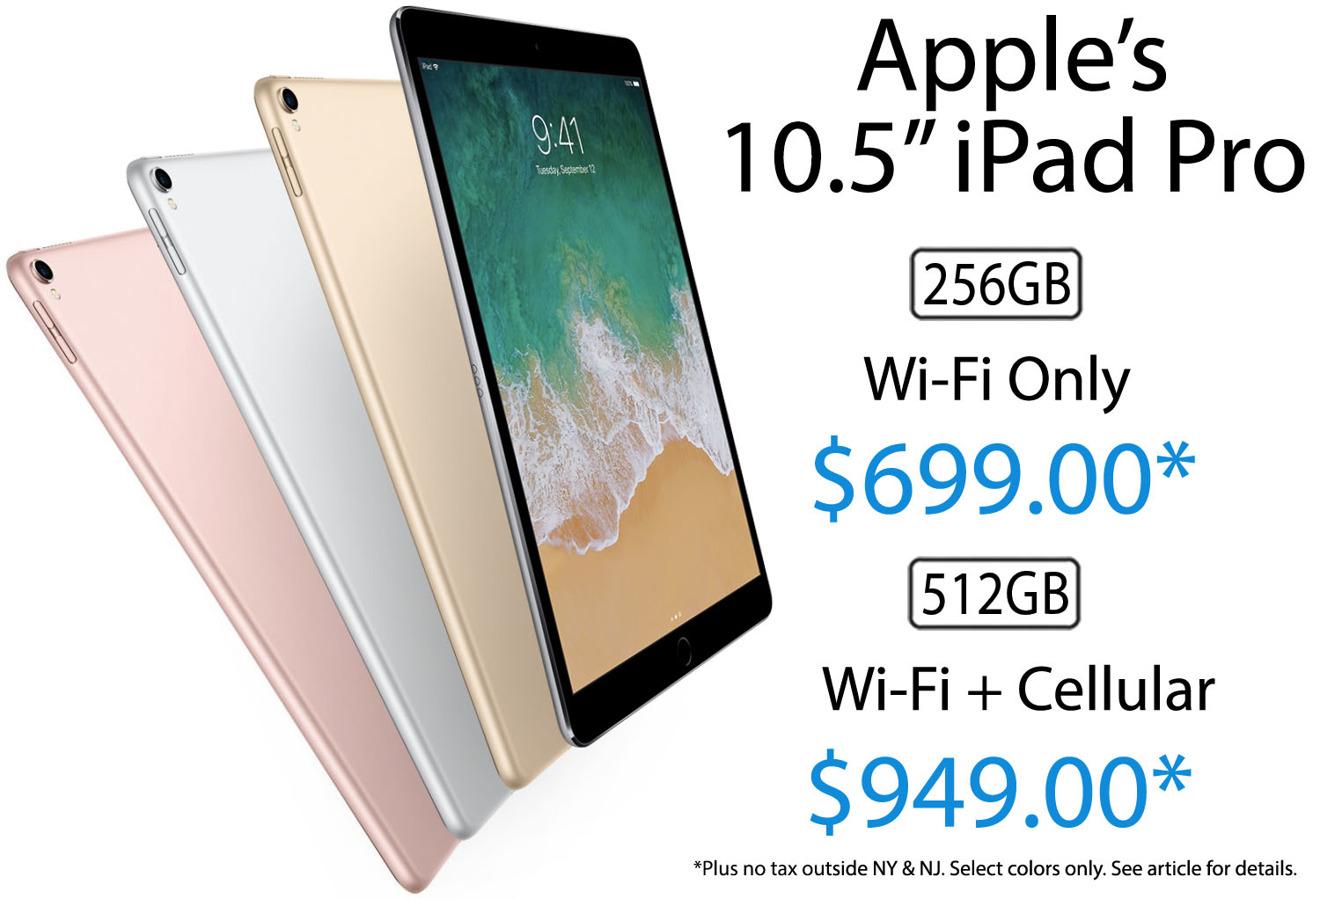 Apple iPad Pro with exclusive savings